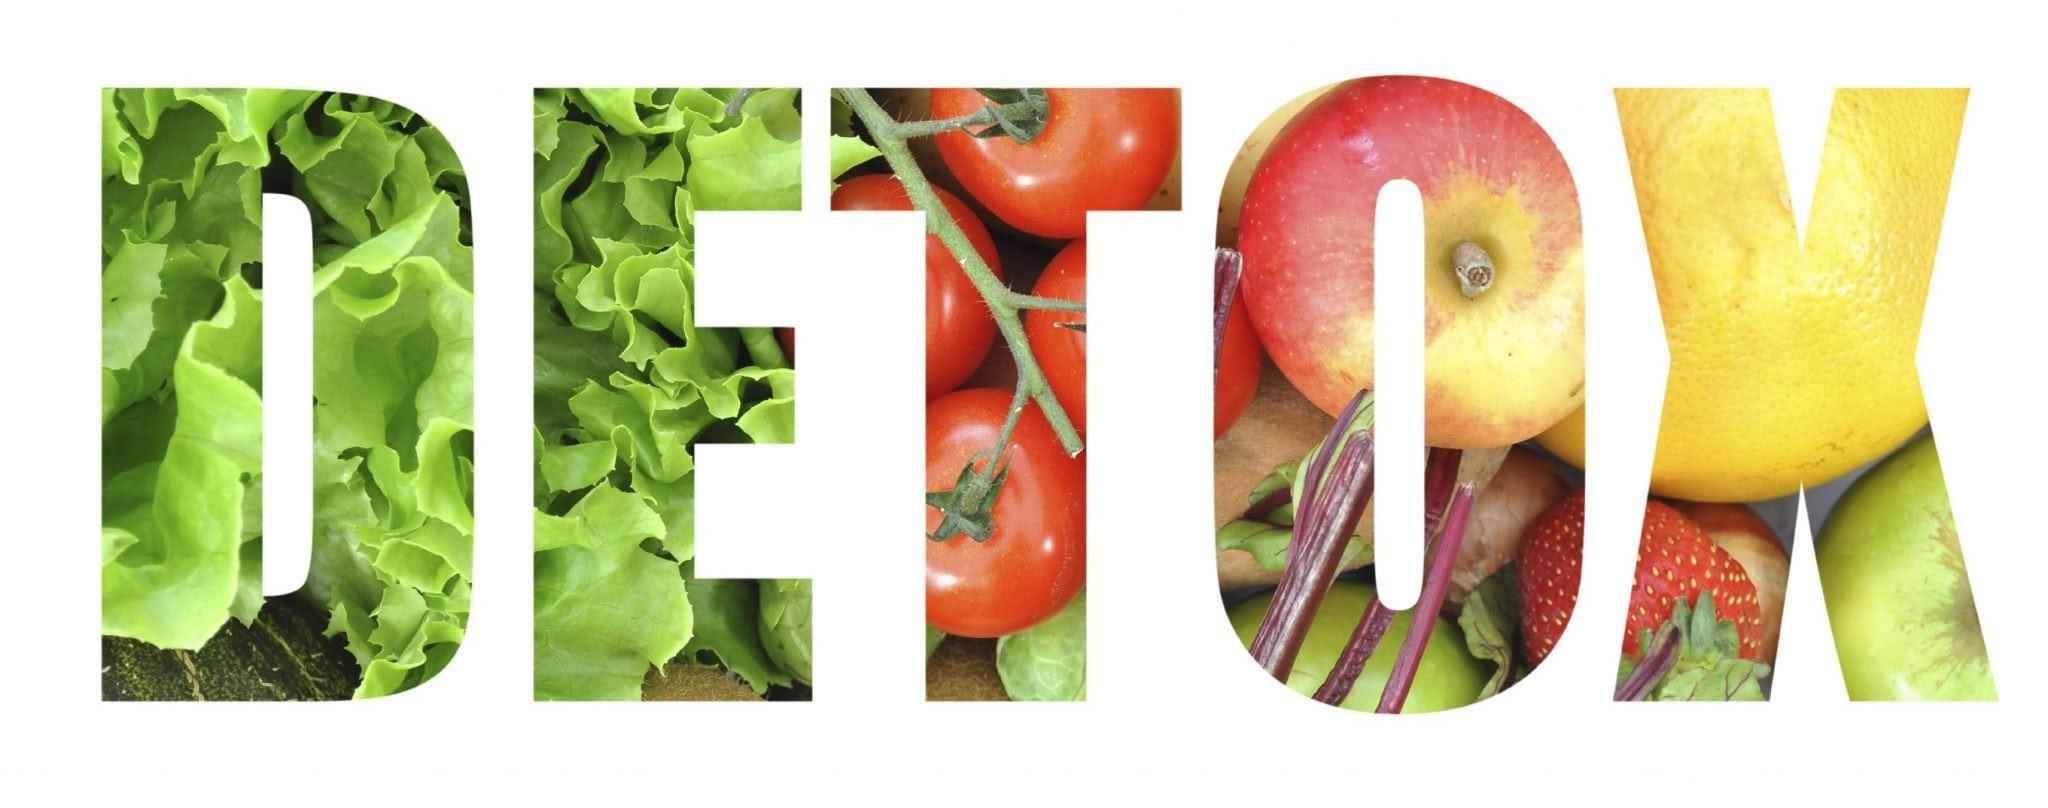 Dr John's Remedies | Detox Body Toxins Healthy Eating Cbd Hemp Oil